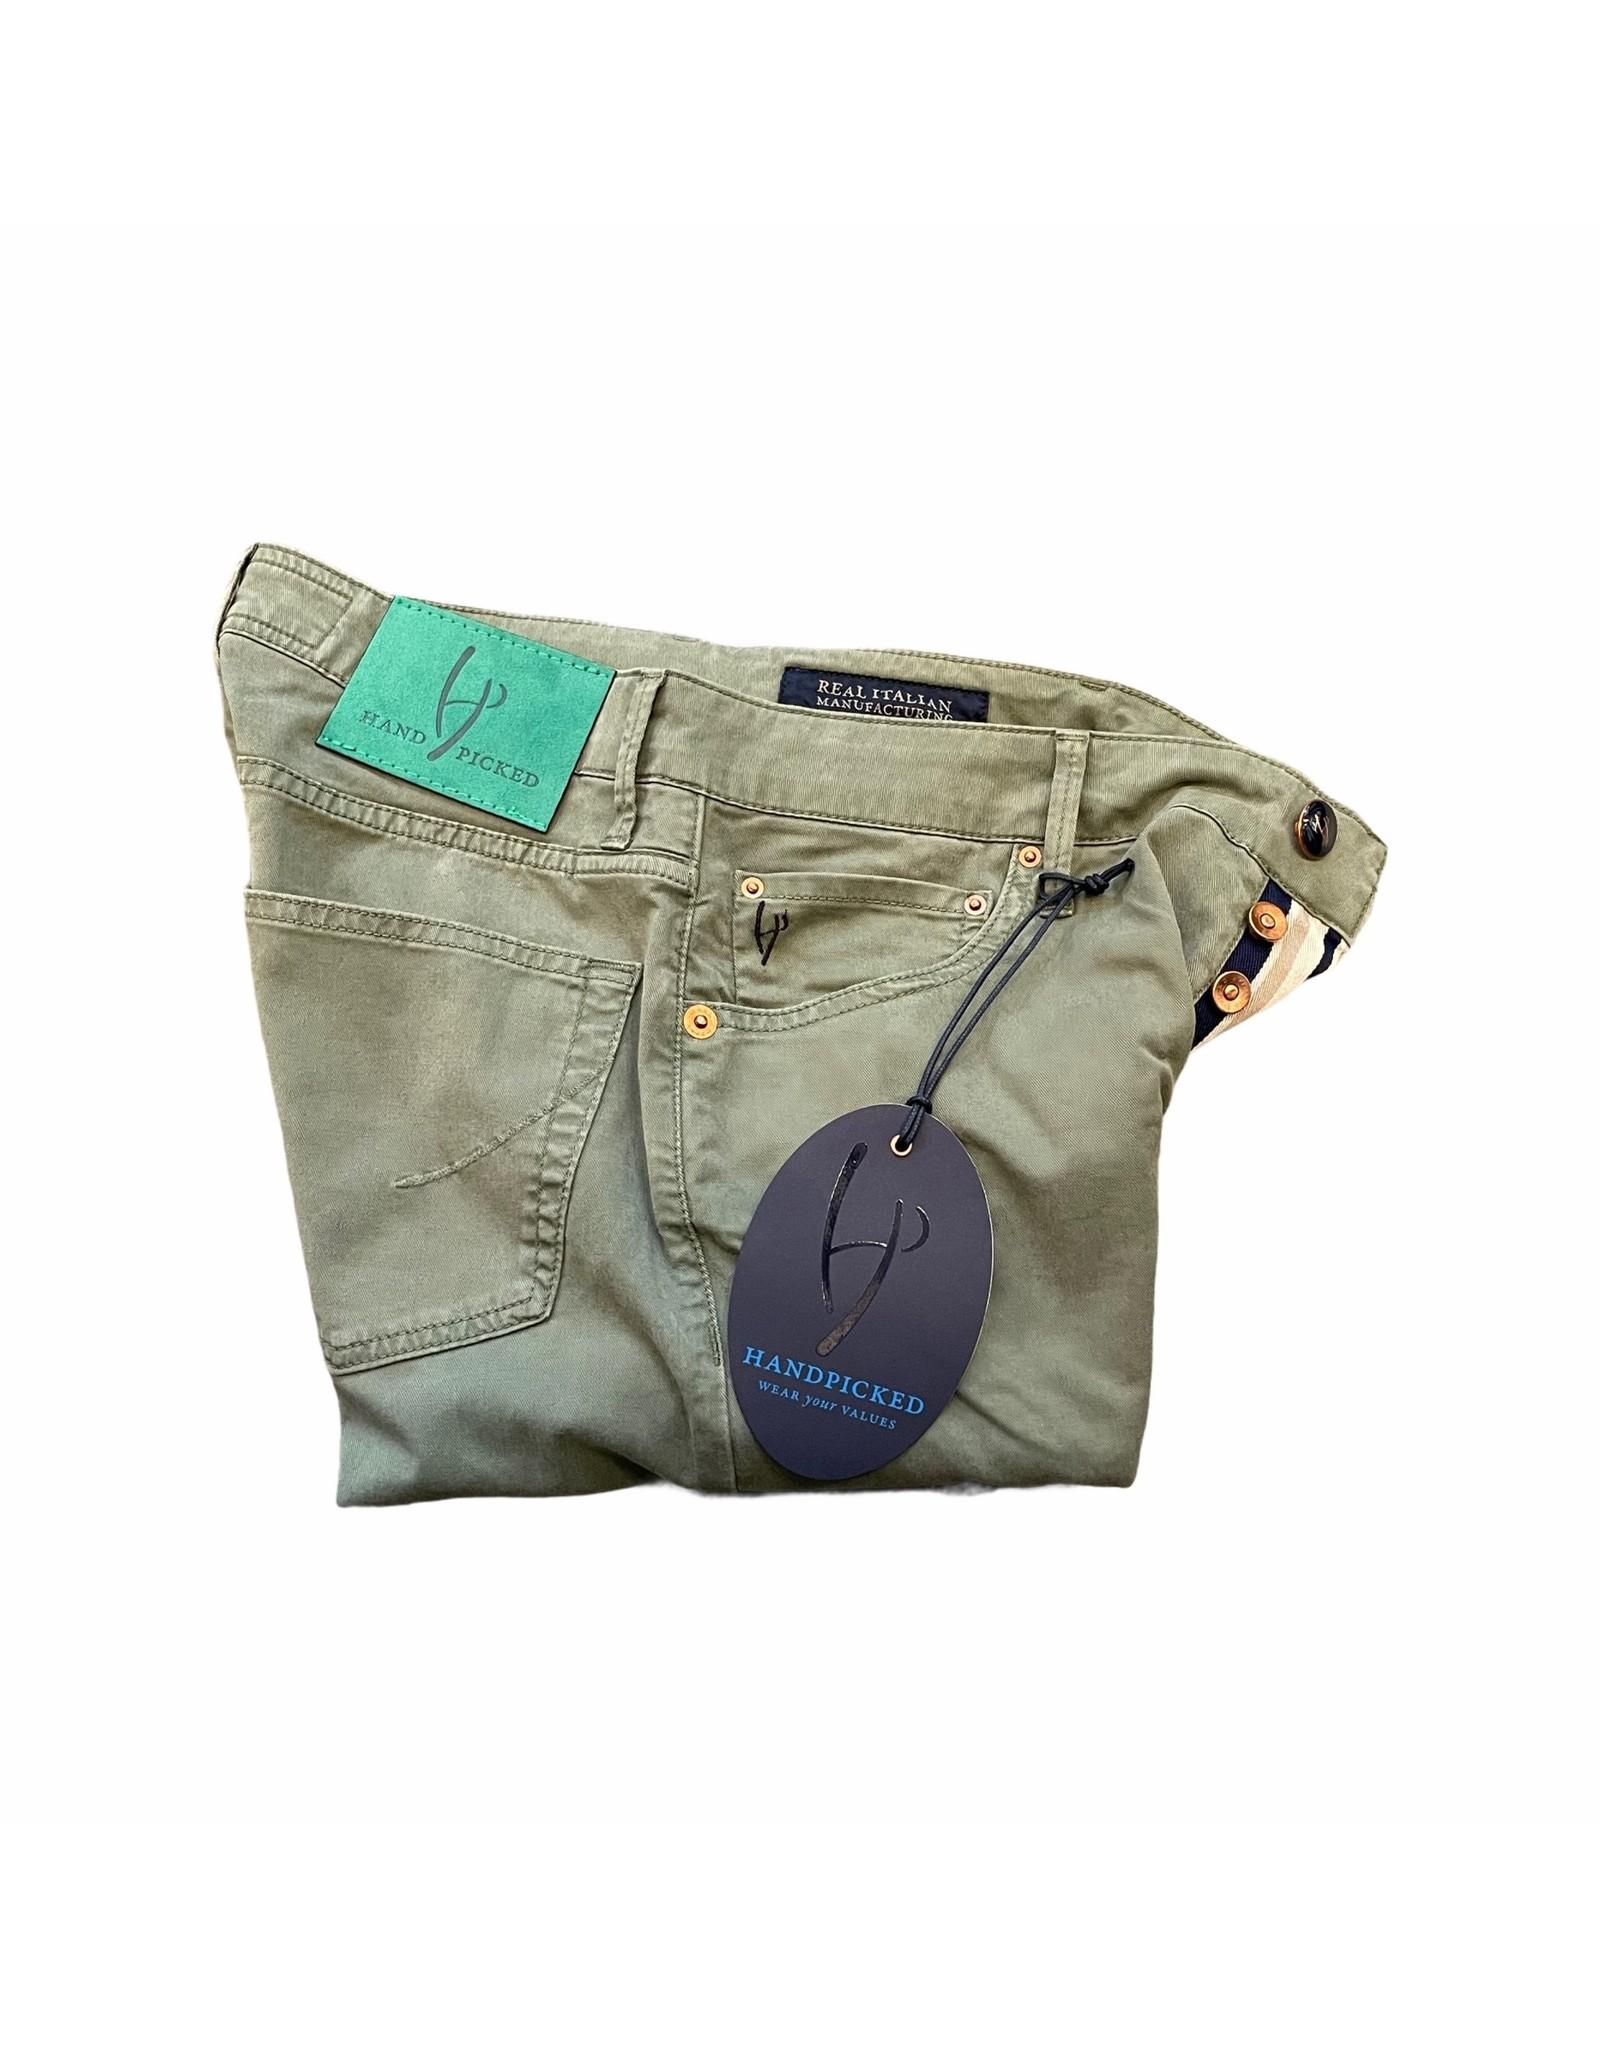 Hand Picked 21/1 Hand Picked  Jeans ORVIETO-C  01831 S